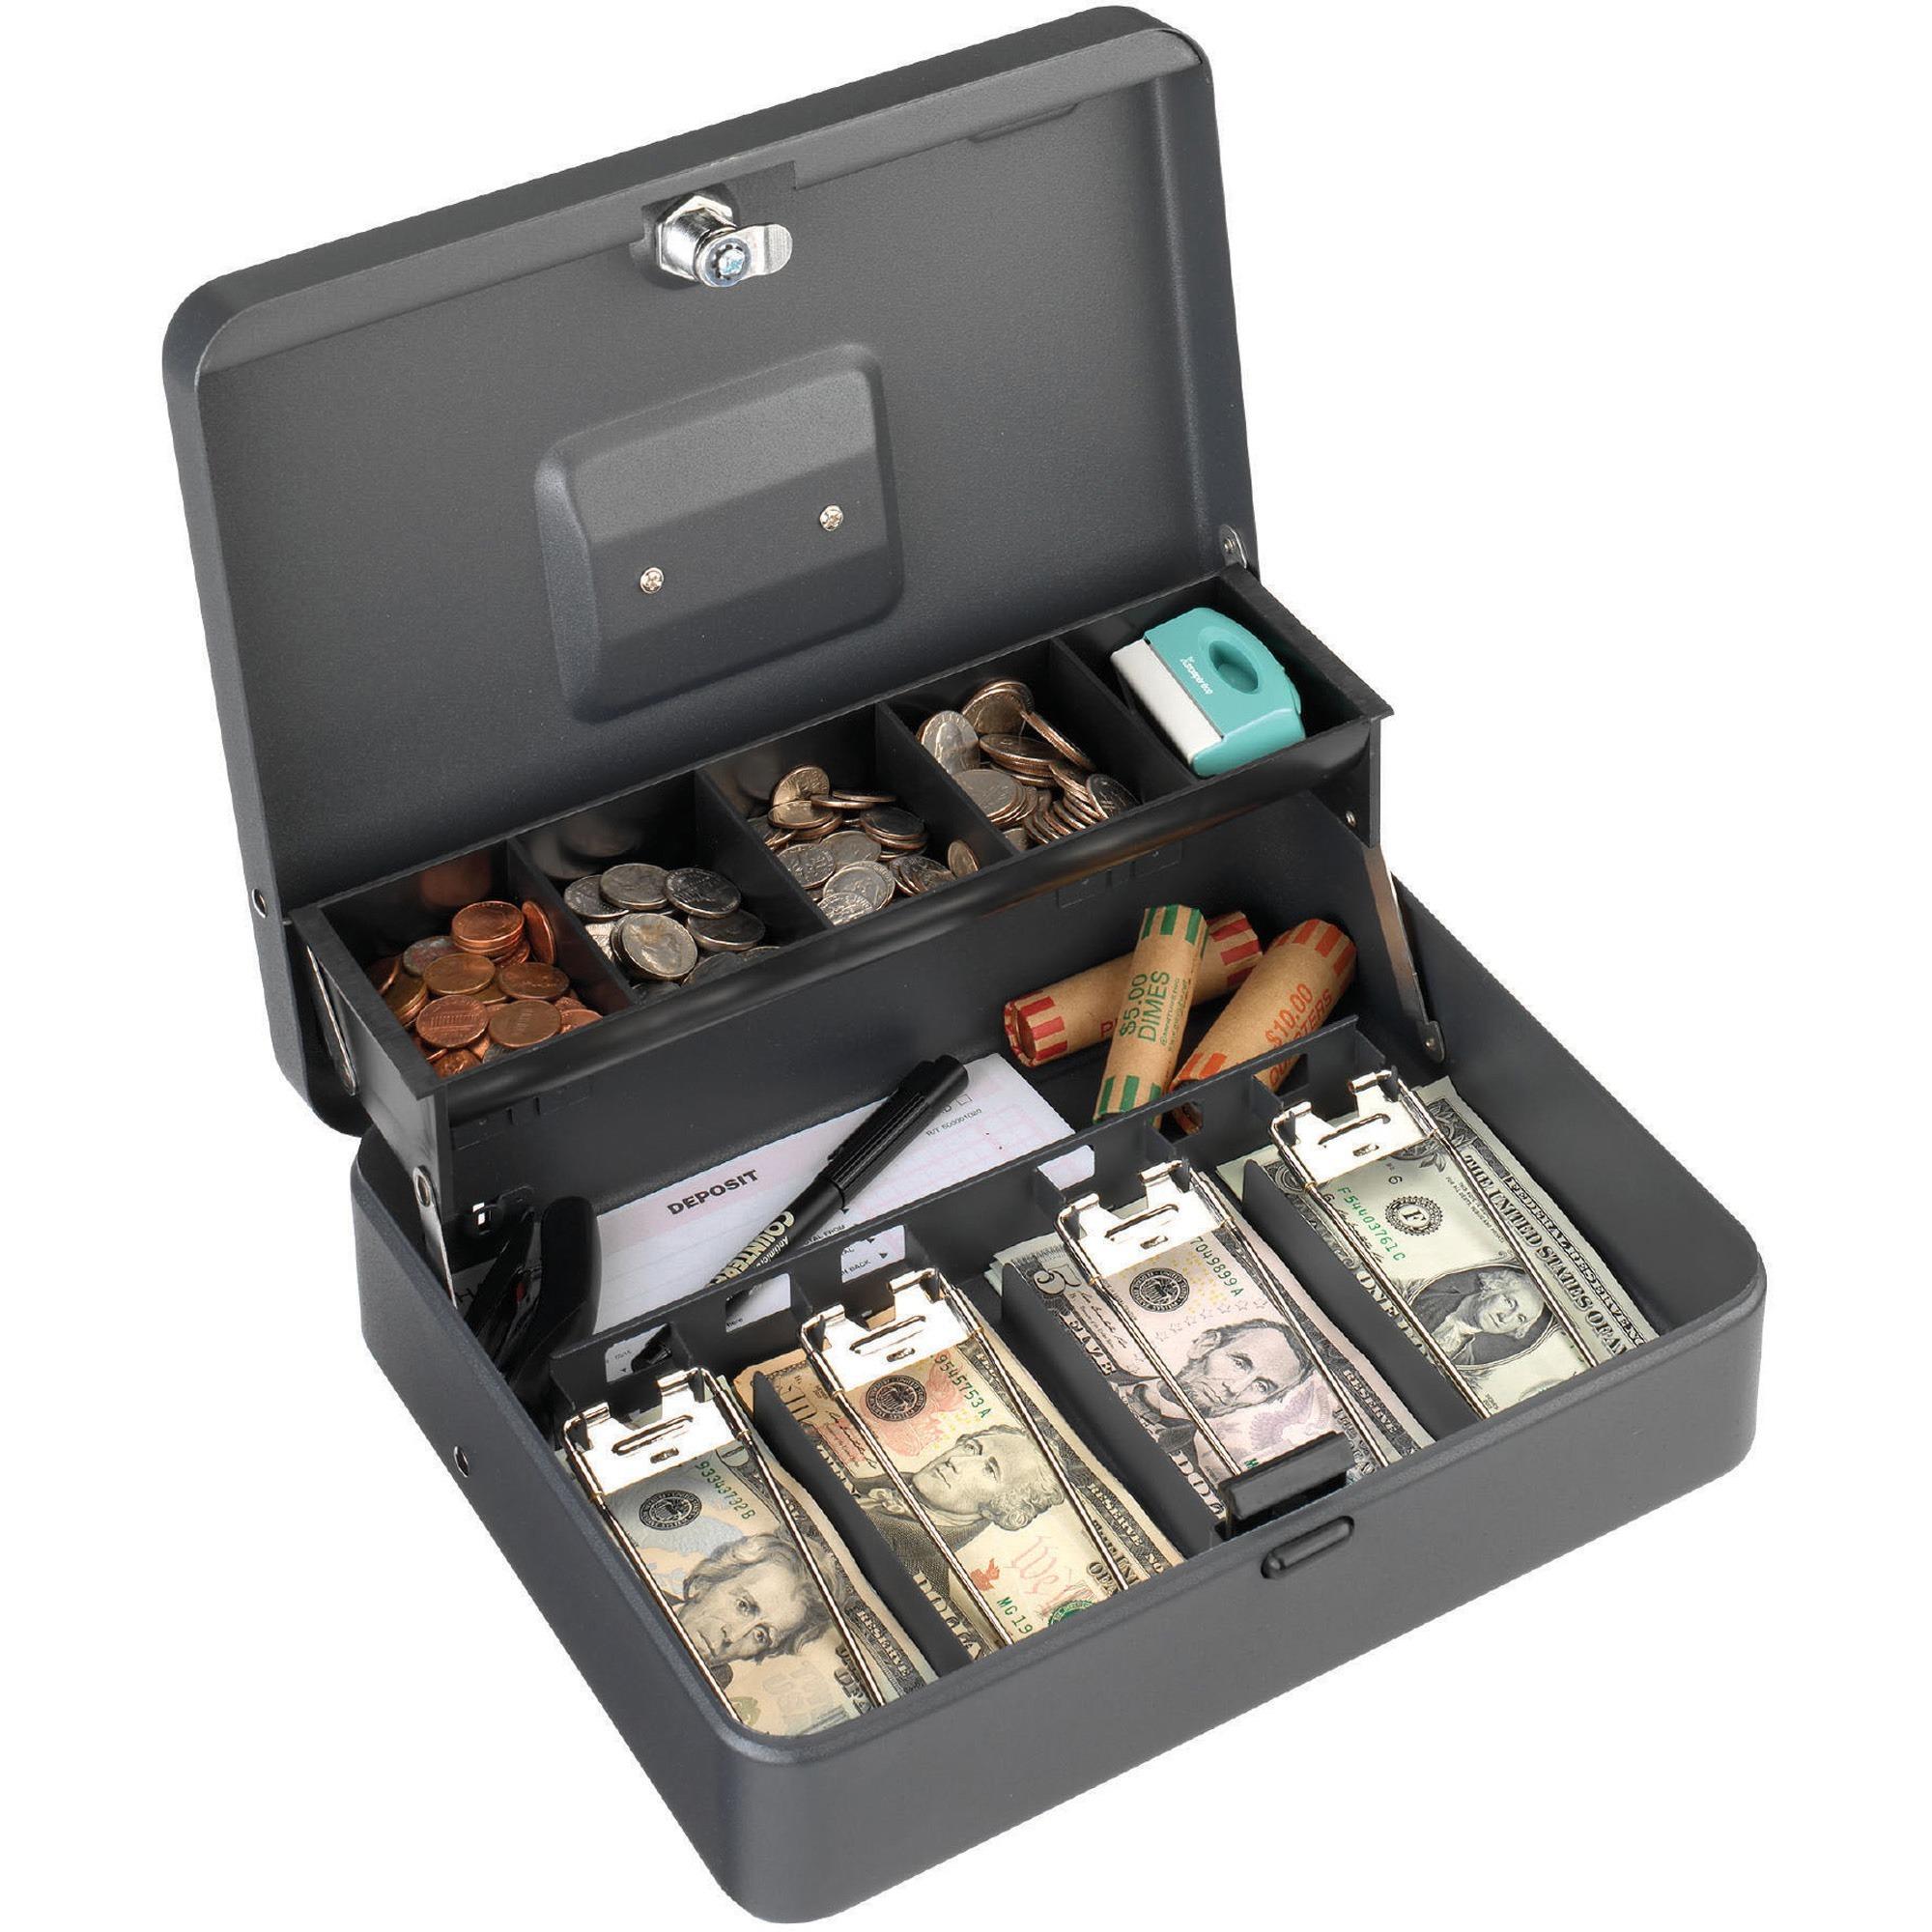 "Steelmaster Tiered Tray Cash Box - 4 Bill - 5 Coin - Steel - Gray - 3.2"" Height x 11.8"" Width x 9.4"" Depth"